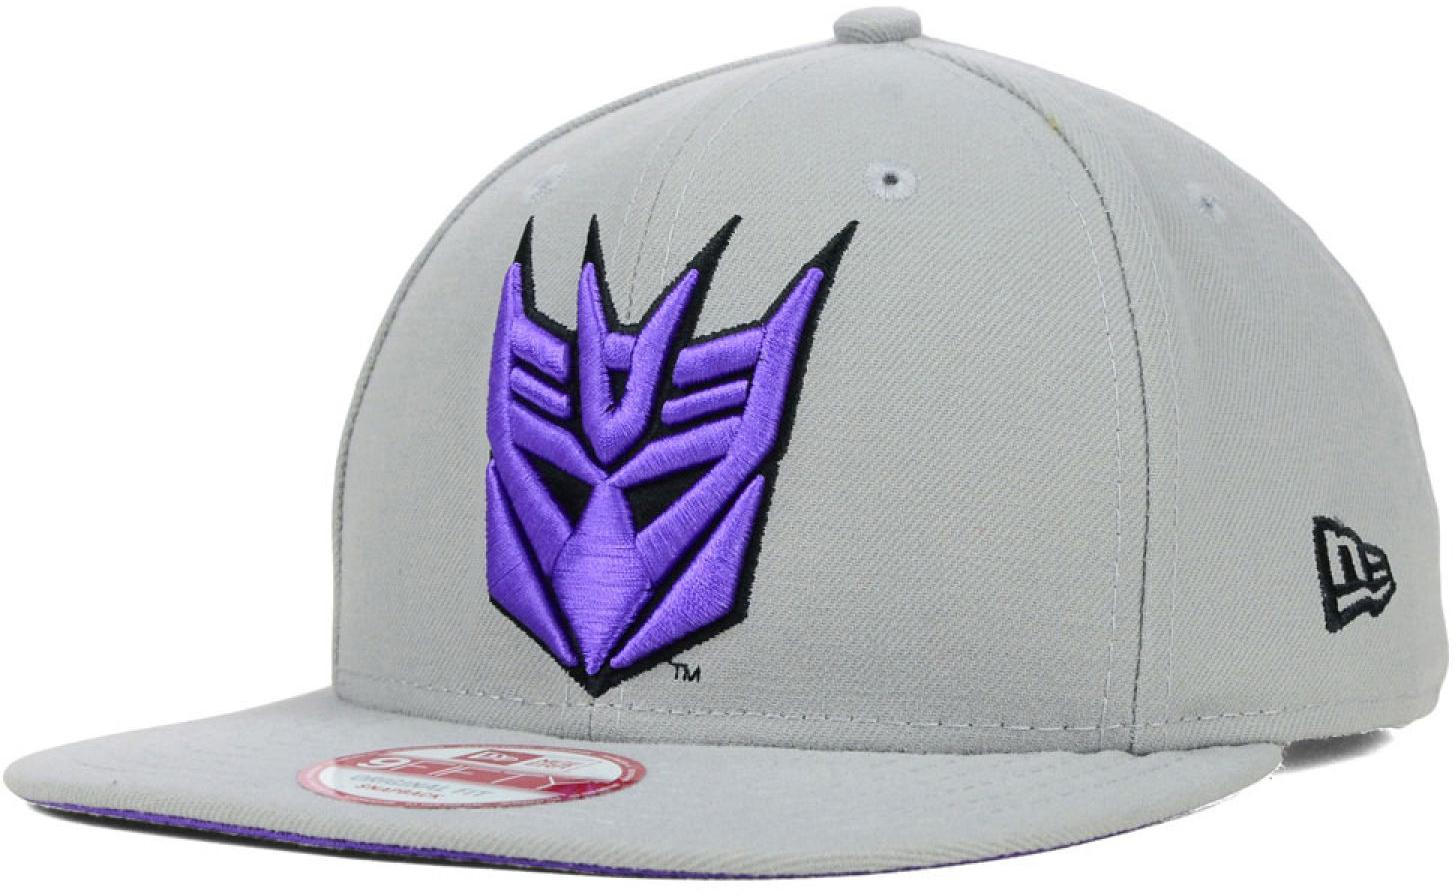 645da76a Details about New Era Transformers Decepticons Megatron Logo Practice  9Fifty Snapback Cap Hat